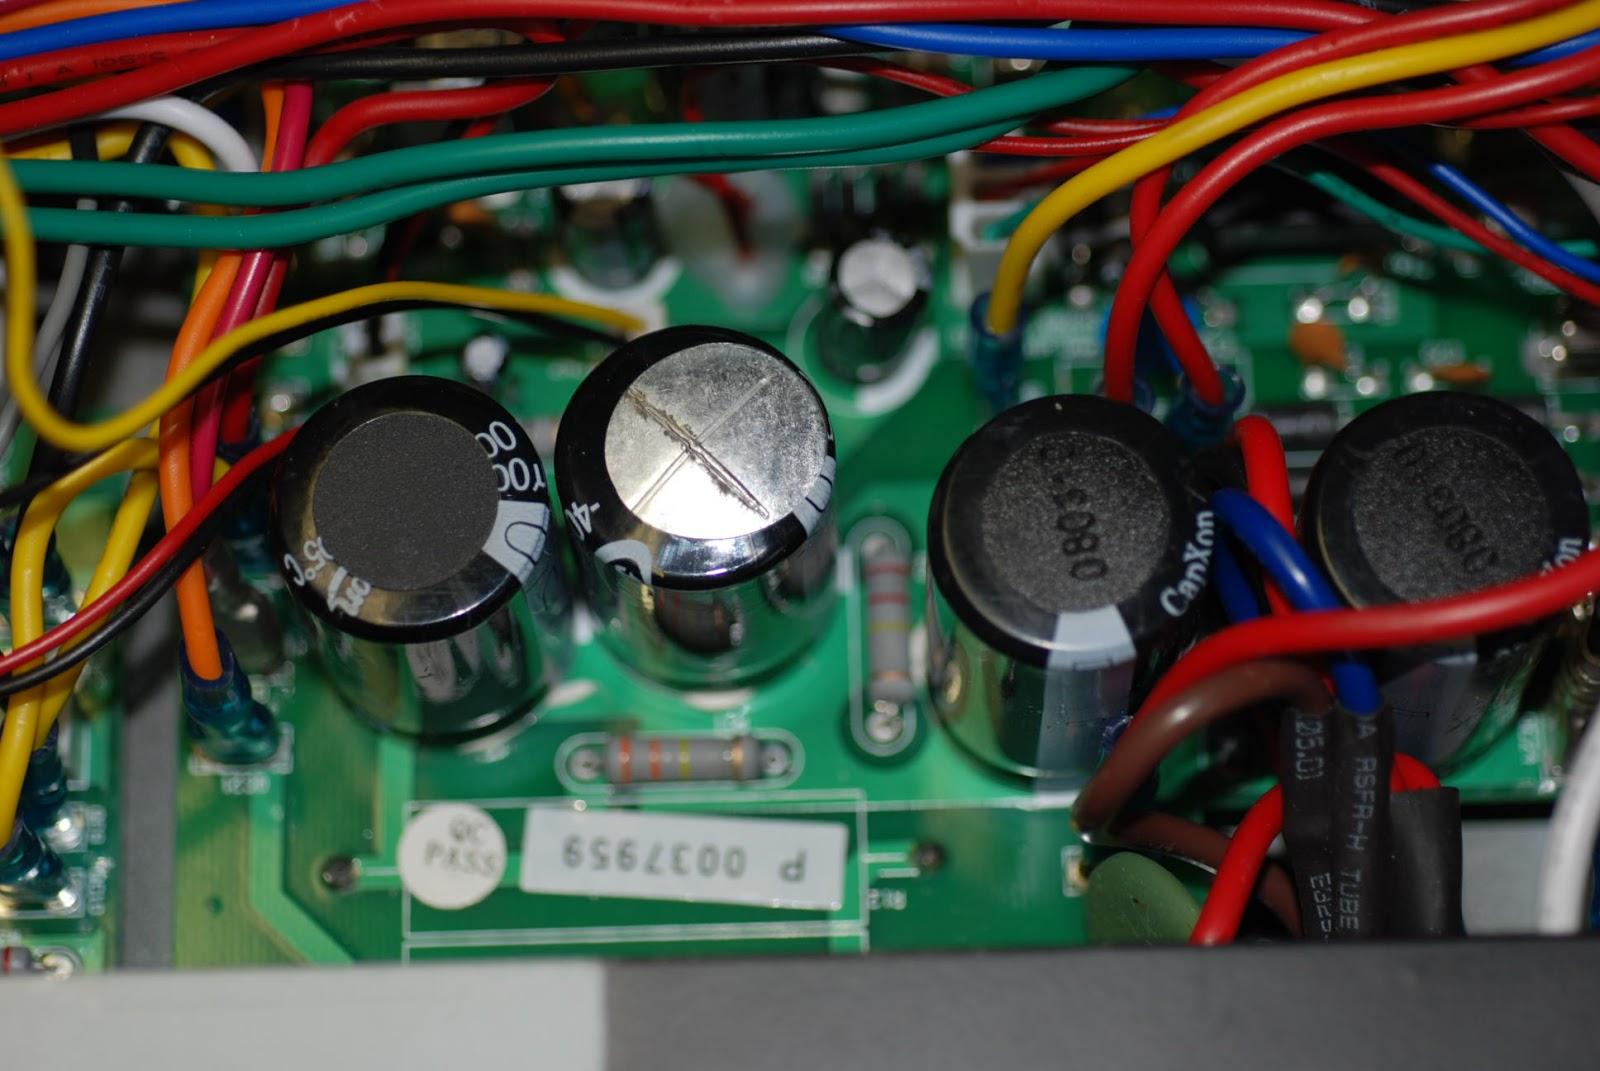 DSC_2779 judybox revival january 2016 liteon ps-5301-08ha wiring diagram at fashall.co